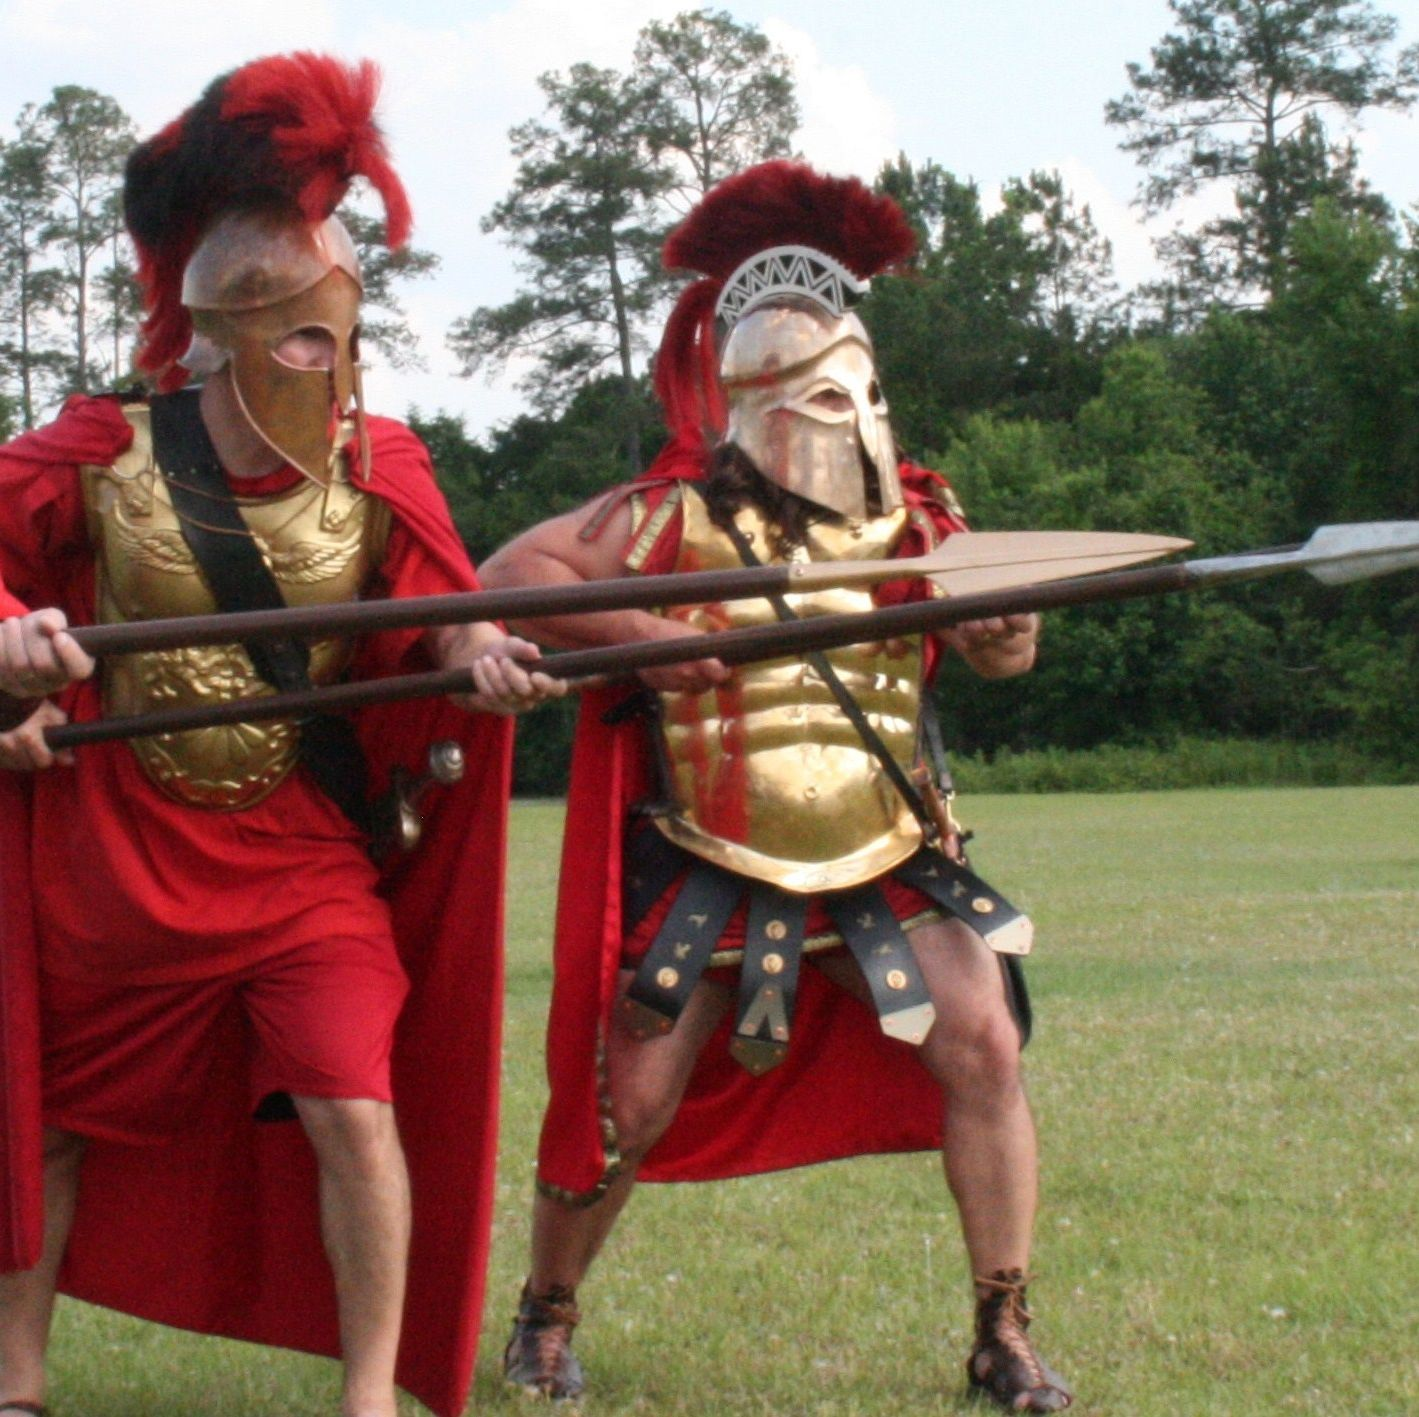 Warriors of greece 5 2 wohfka